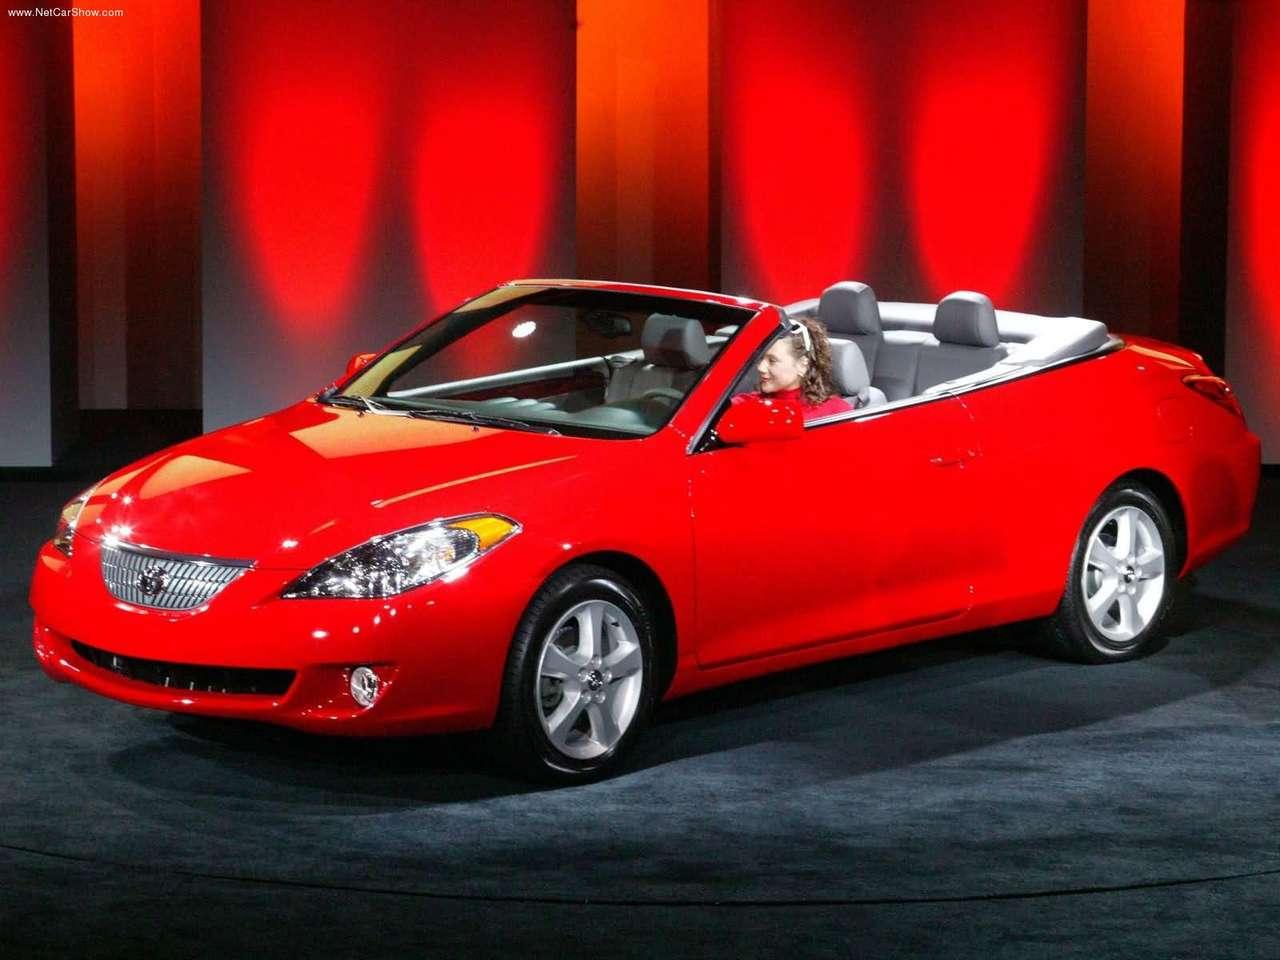 Toyota Camry Solara Convertible Black